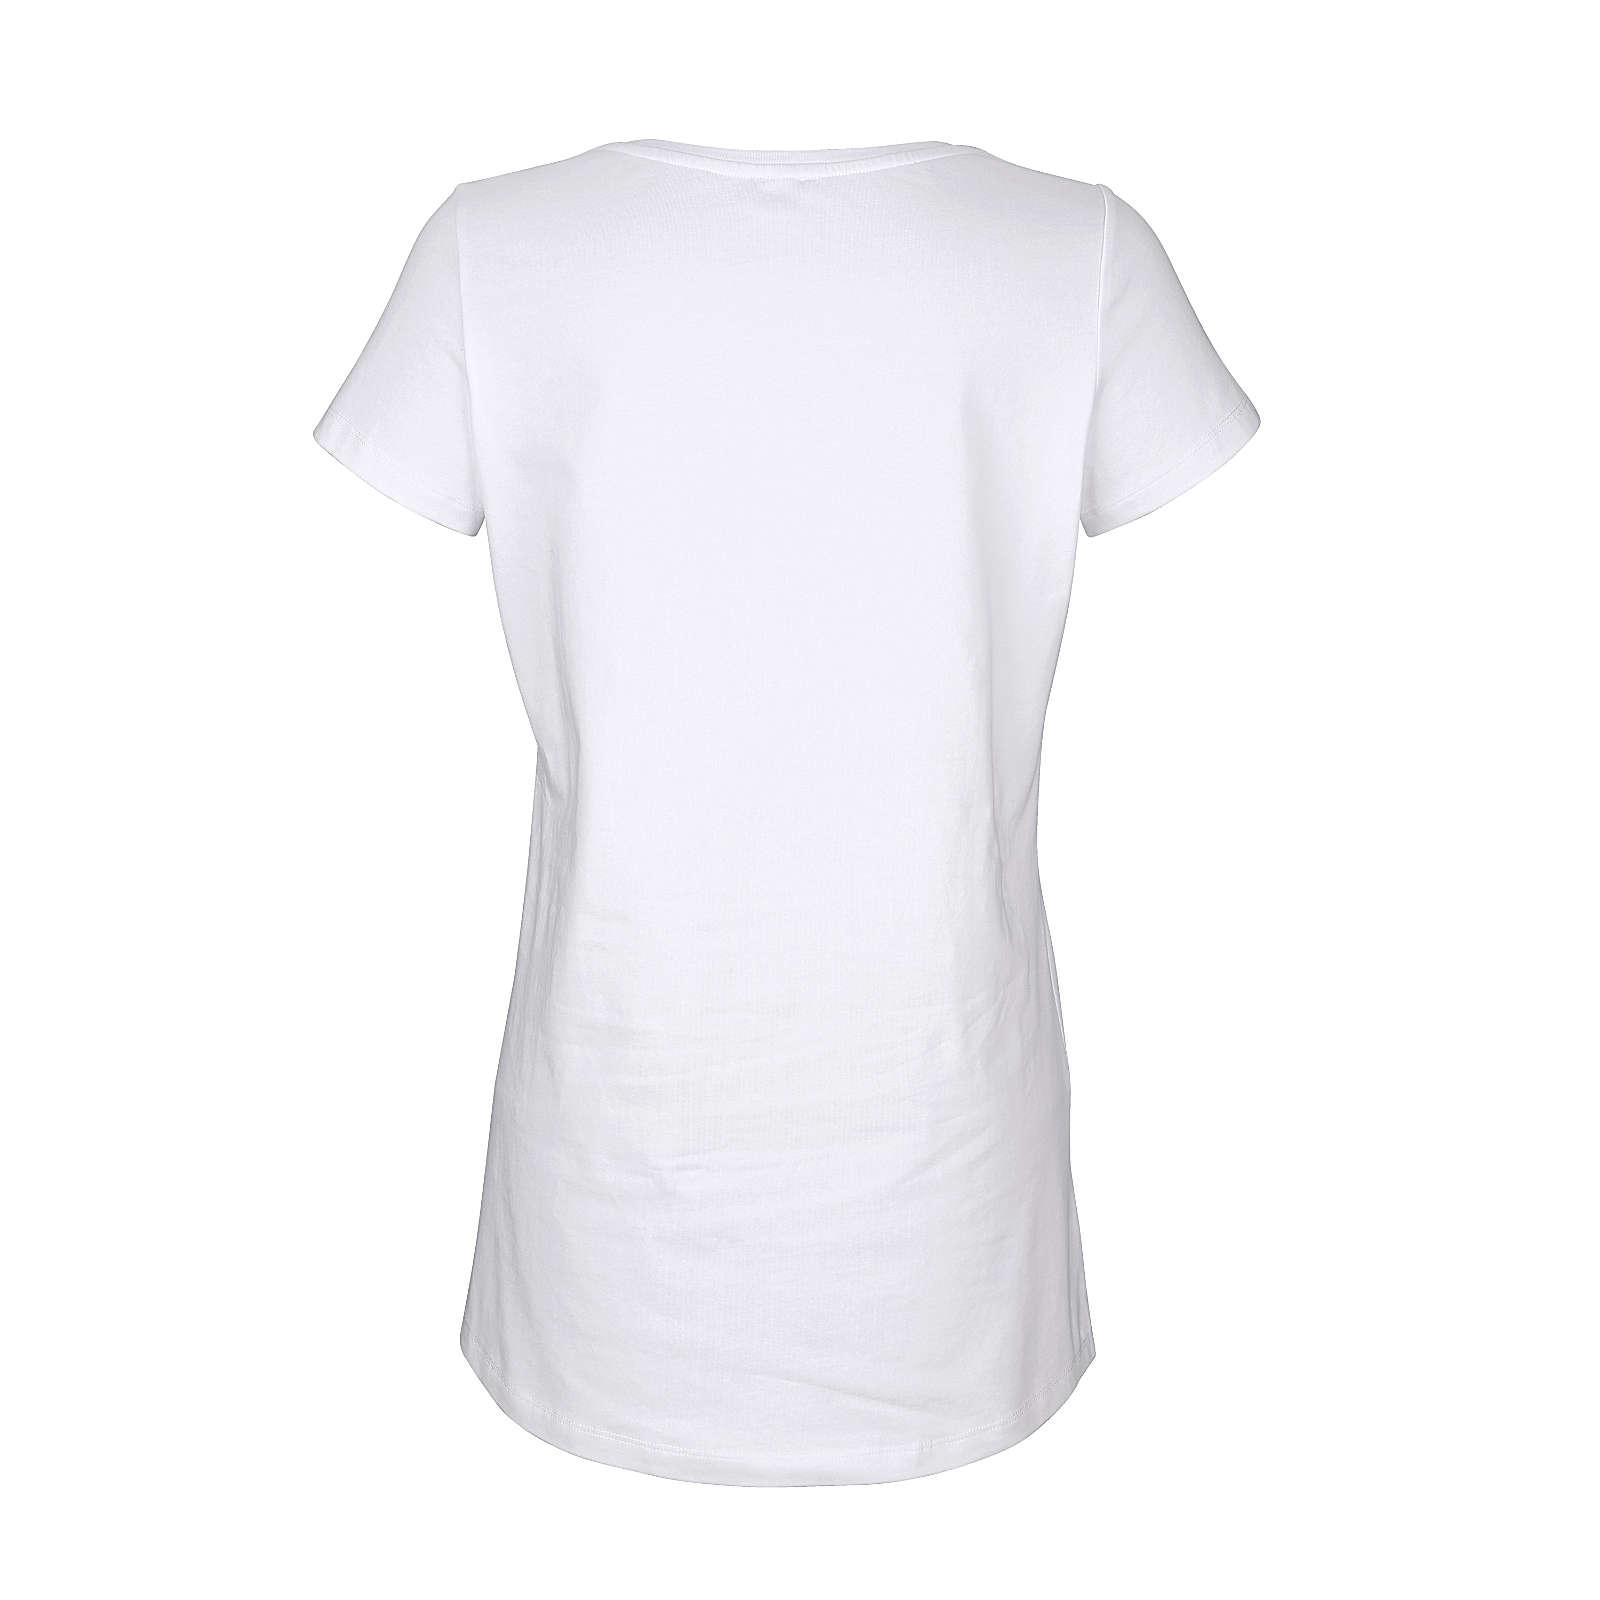 Alba Moda Shirt weiß-kombi Damen Gr. 48